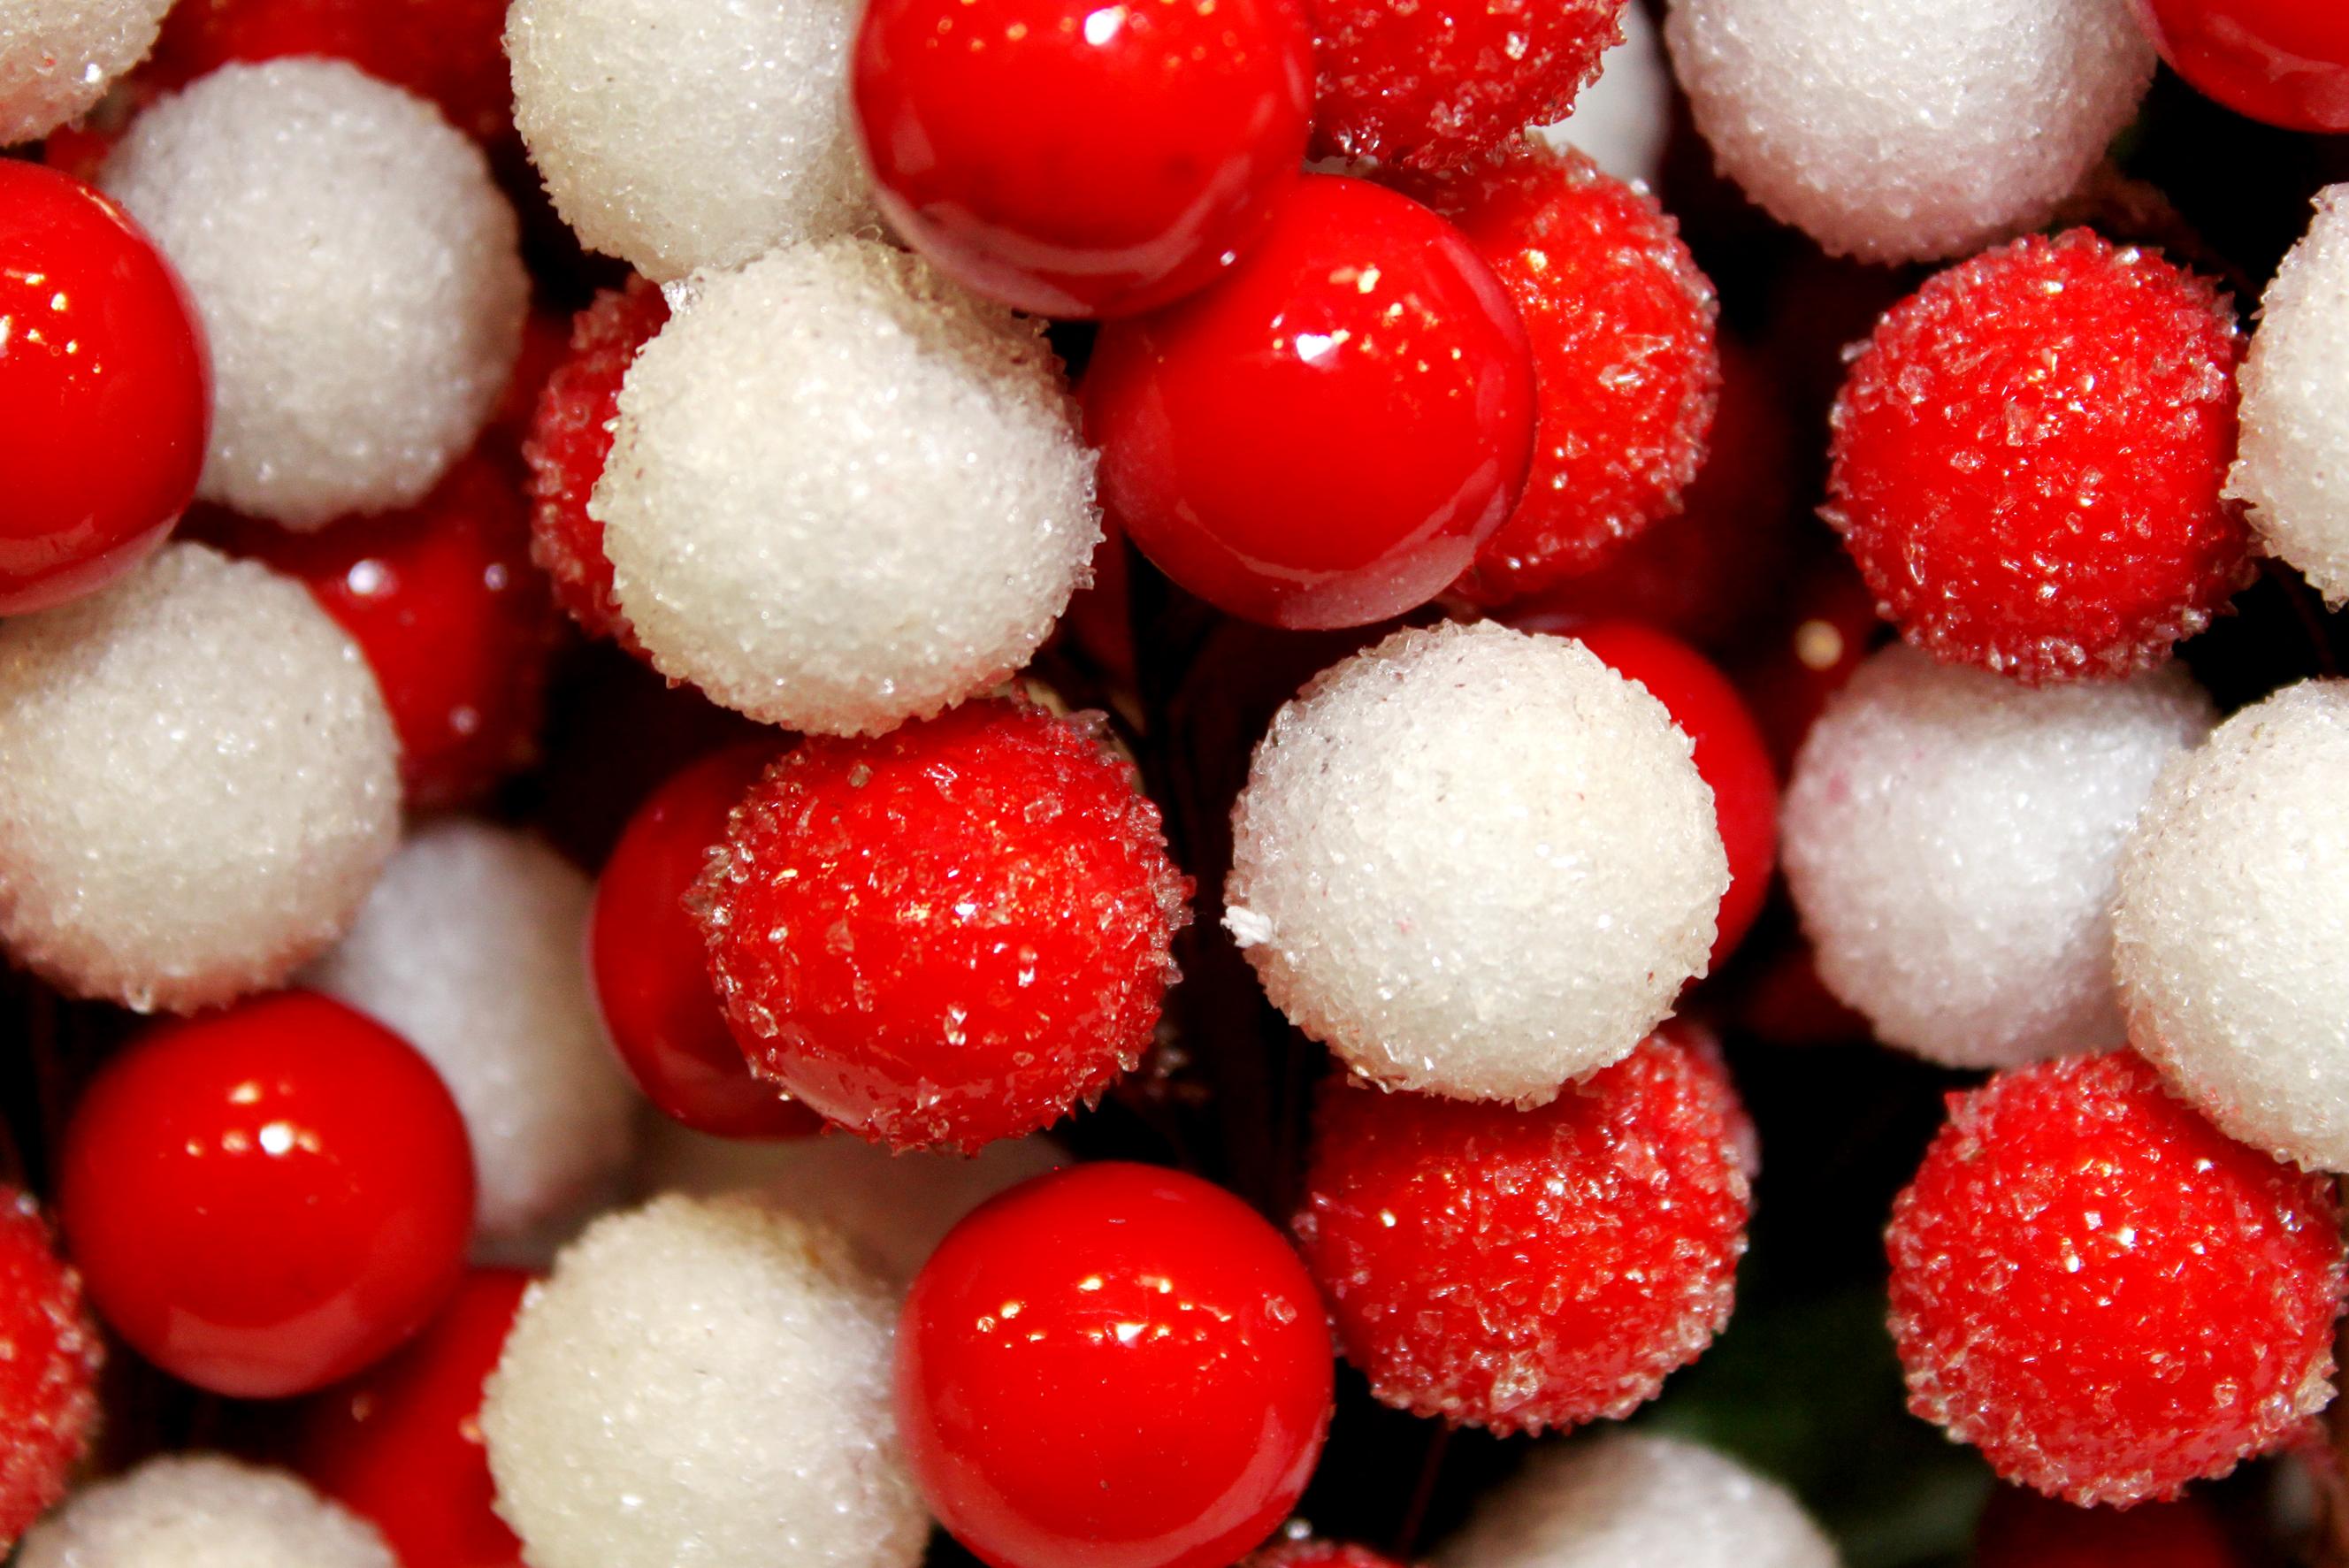 Beads photo